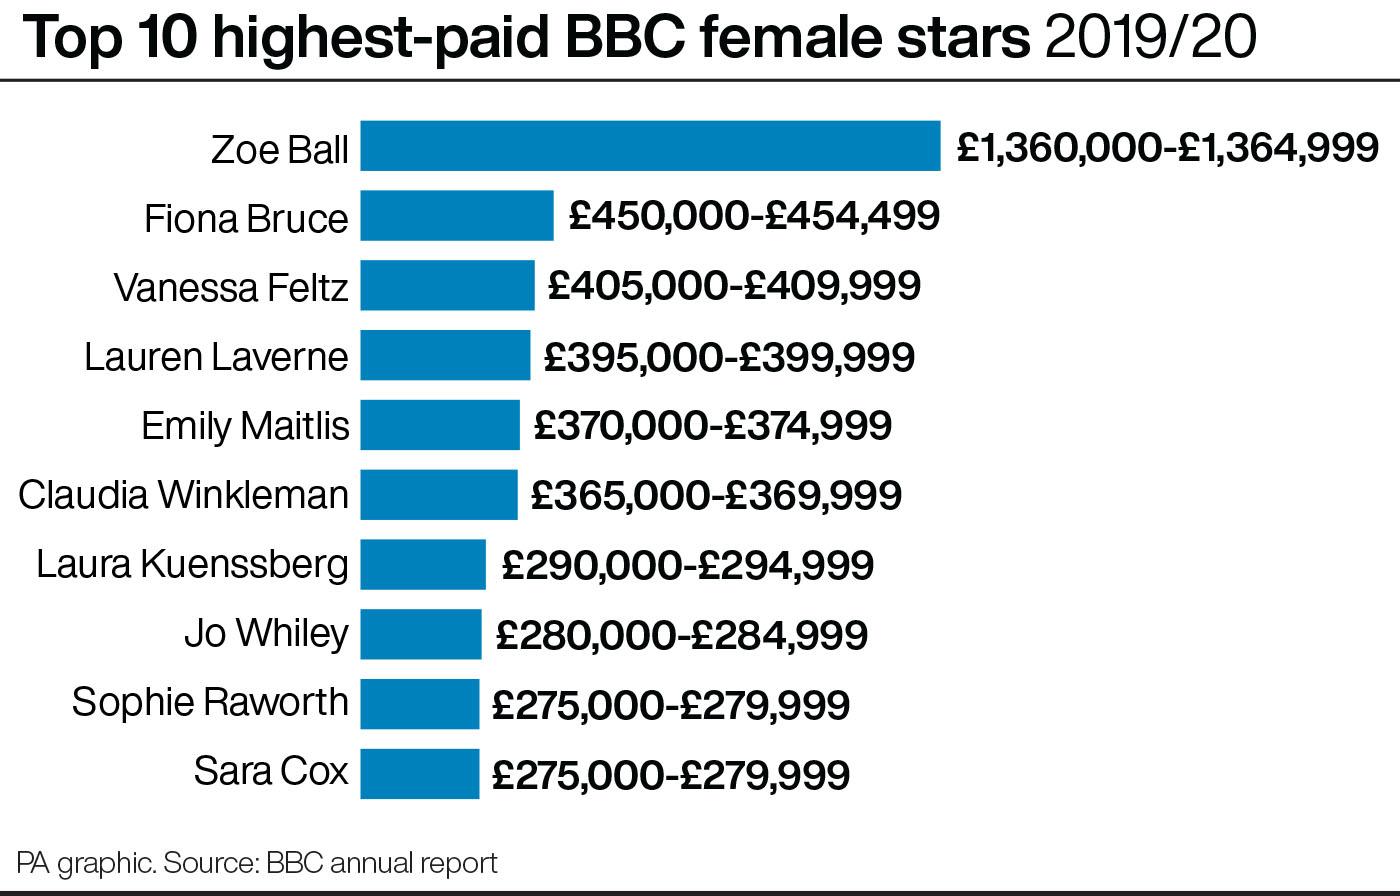 Top 10 highest-paid BBC female stars 2019/20